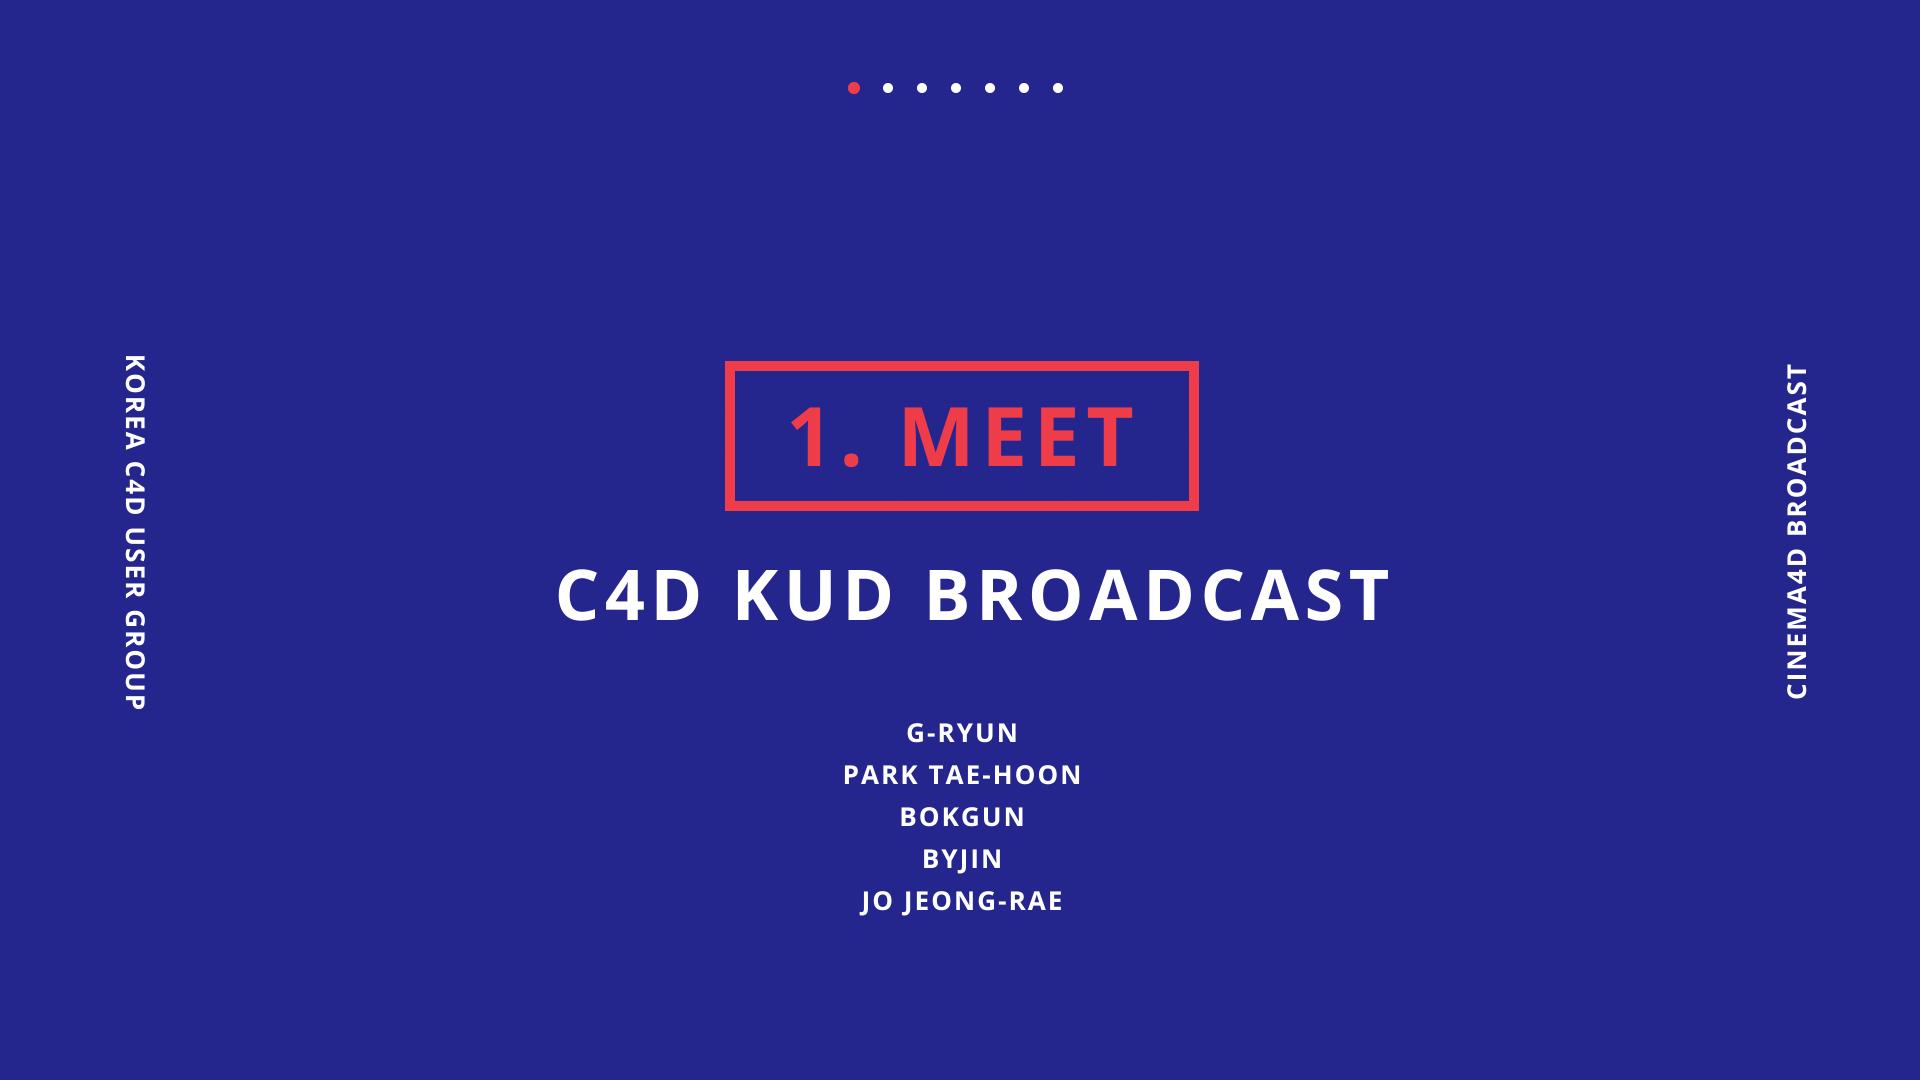 C4D_KUG_BroadCast_1m_00000.png